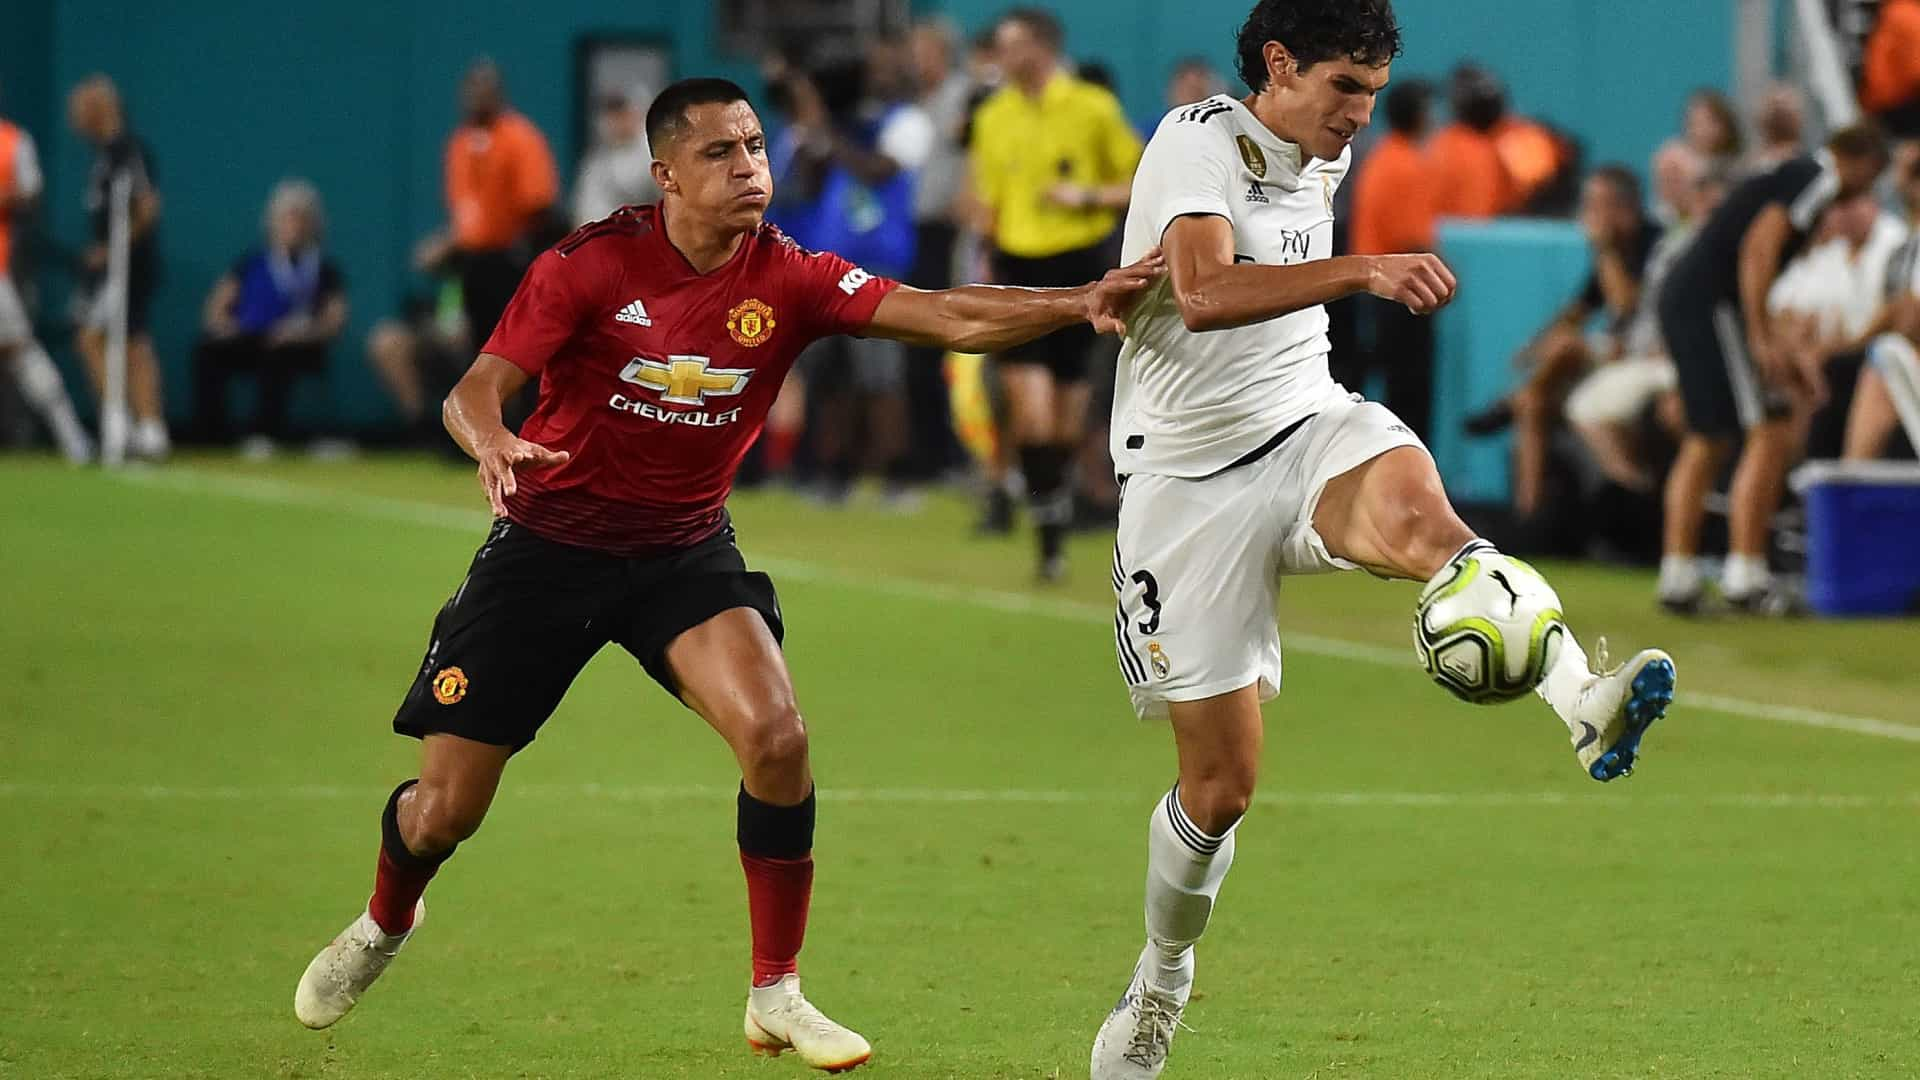 Vallejo lesiona-se e deixa treino do Real Madrid em lágrimas